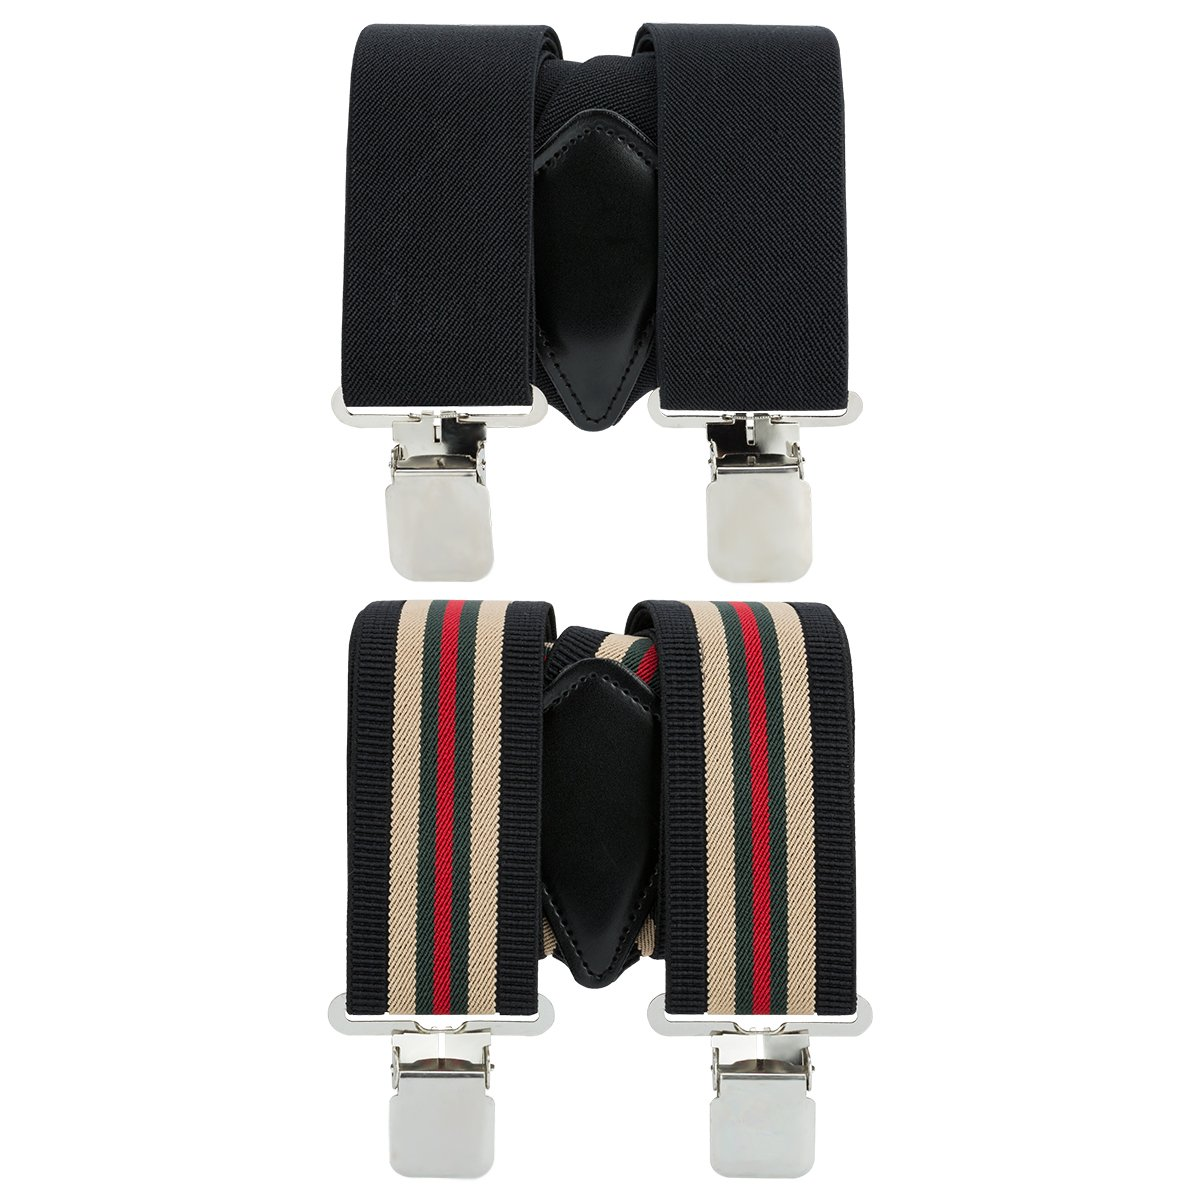 Mens X-Back Heavy Duty Work Suspenders 2'' Wide Adjustable Elastic Clip Suspenders 2pc(Black/Striped) by GradeCode (Image #5)